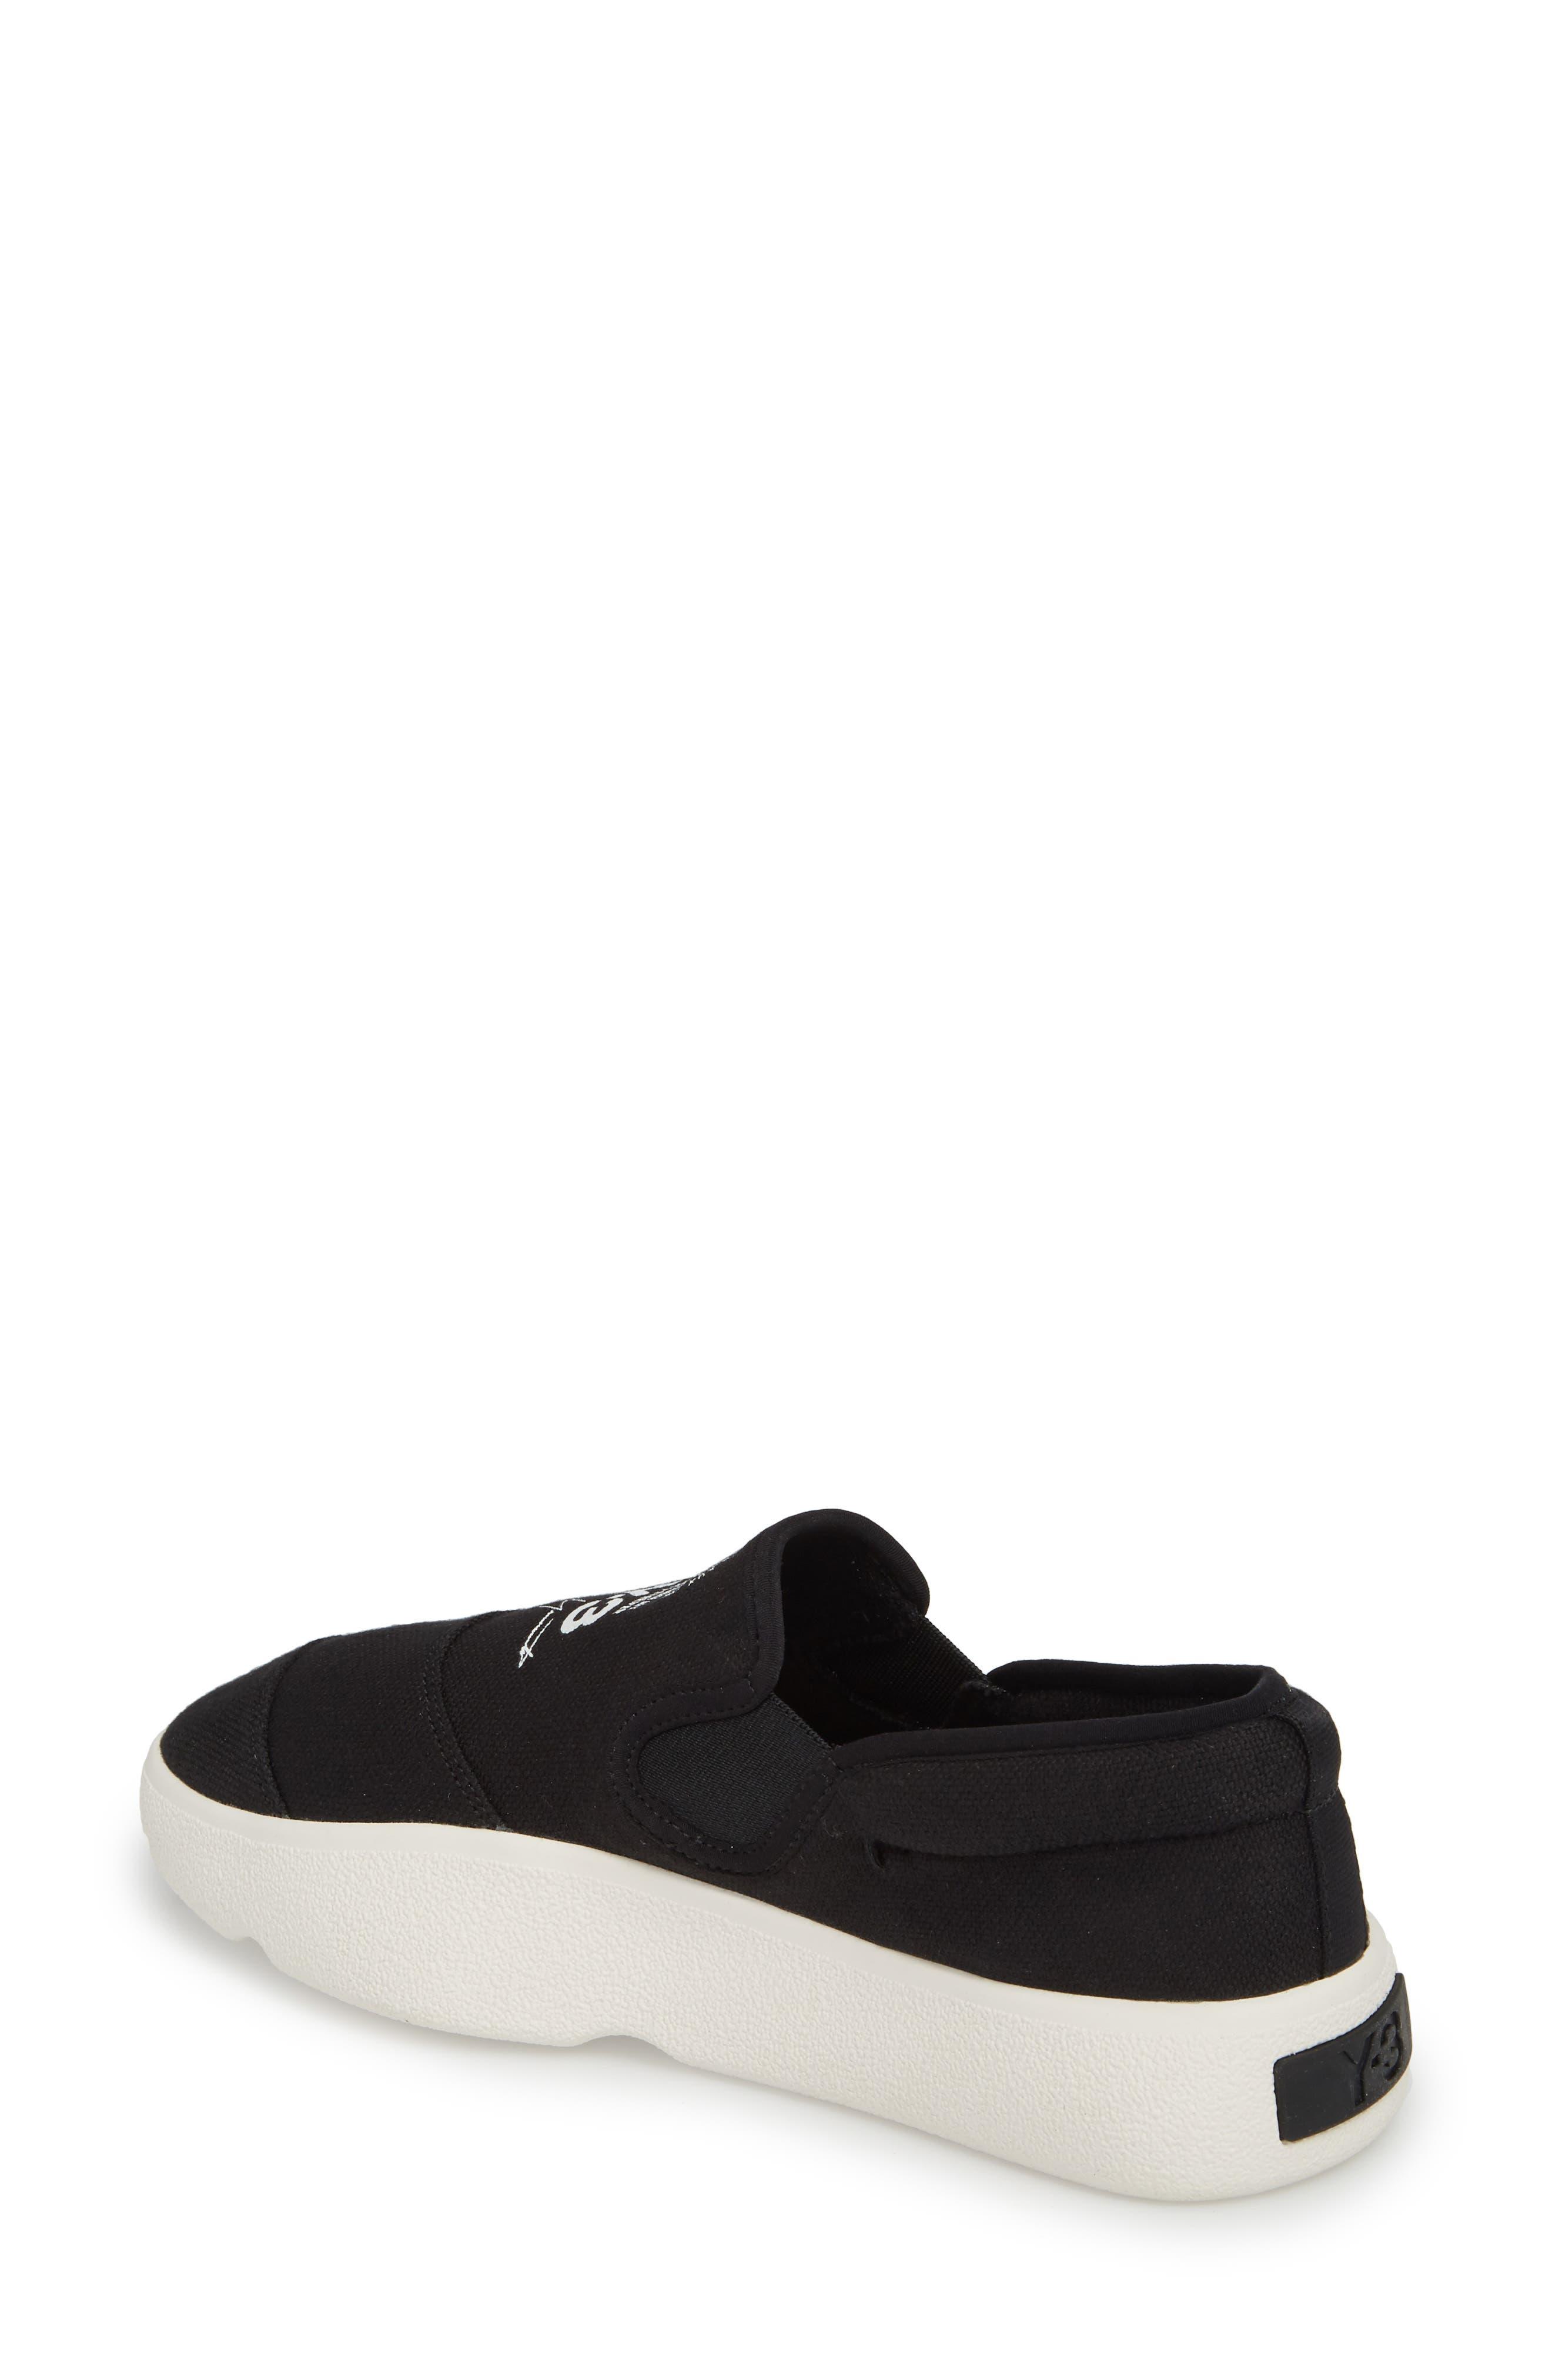 Tangutsu Slip-On Sneaker,                             Alternate thumbnail 2, color,                             001